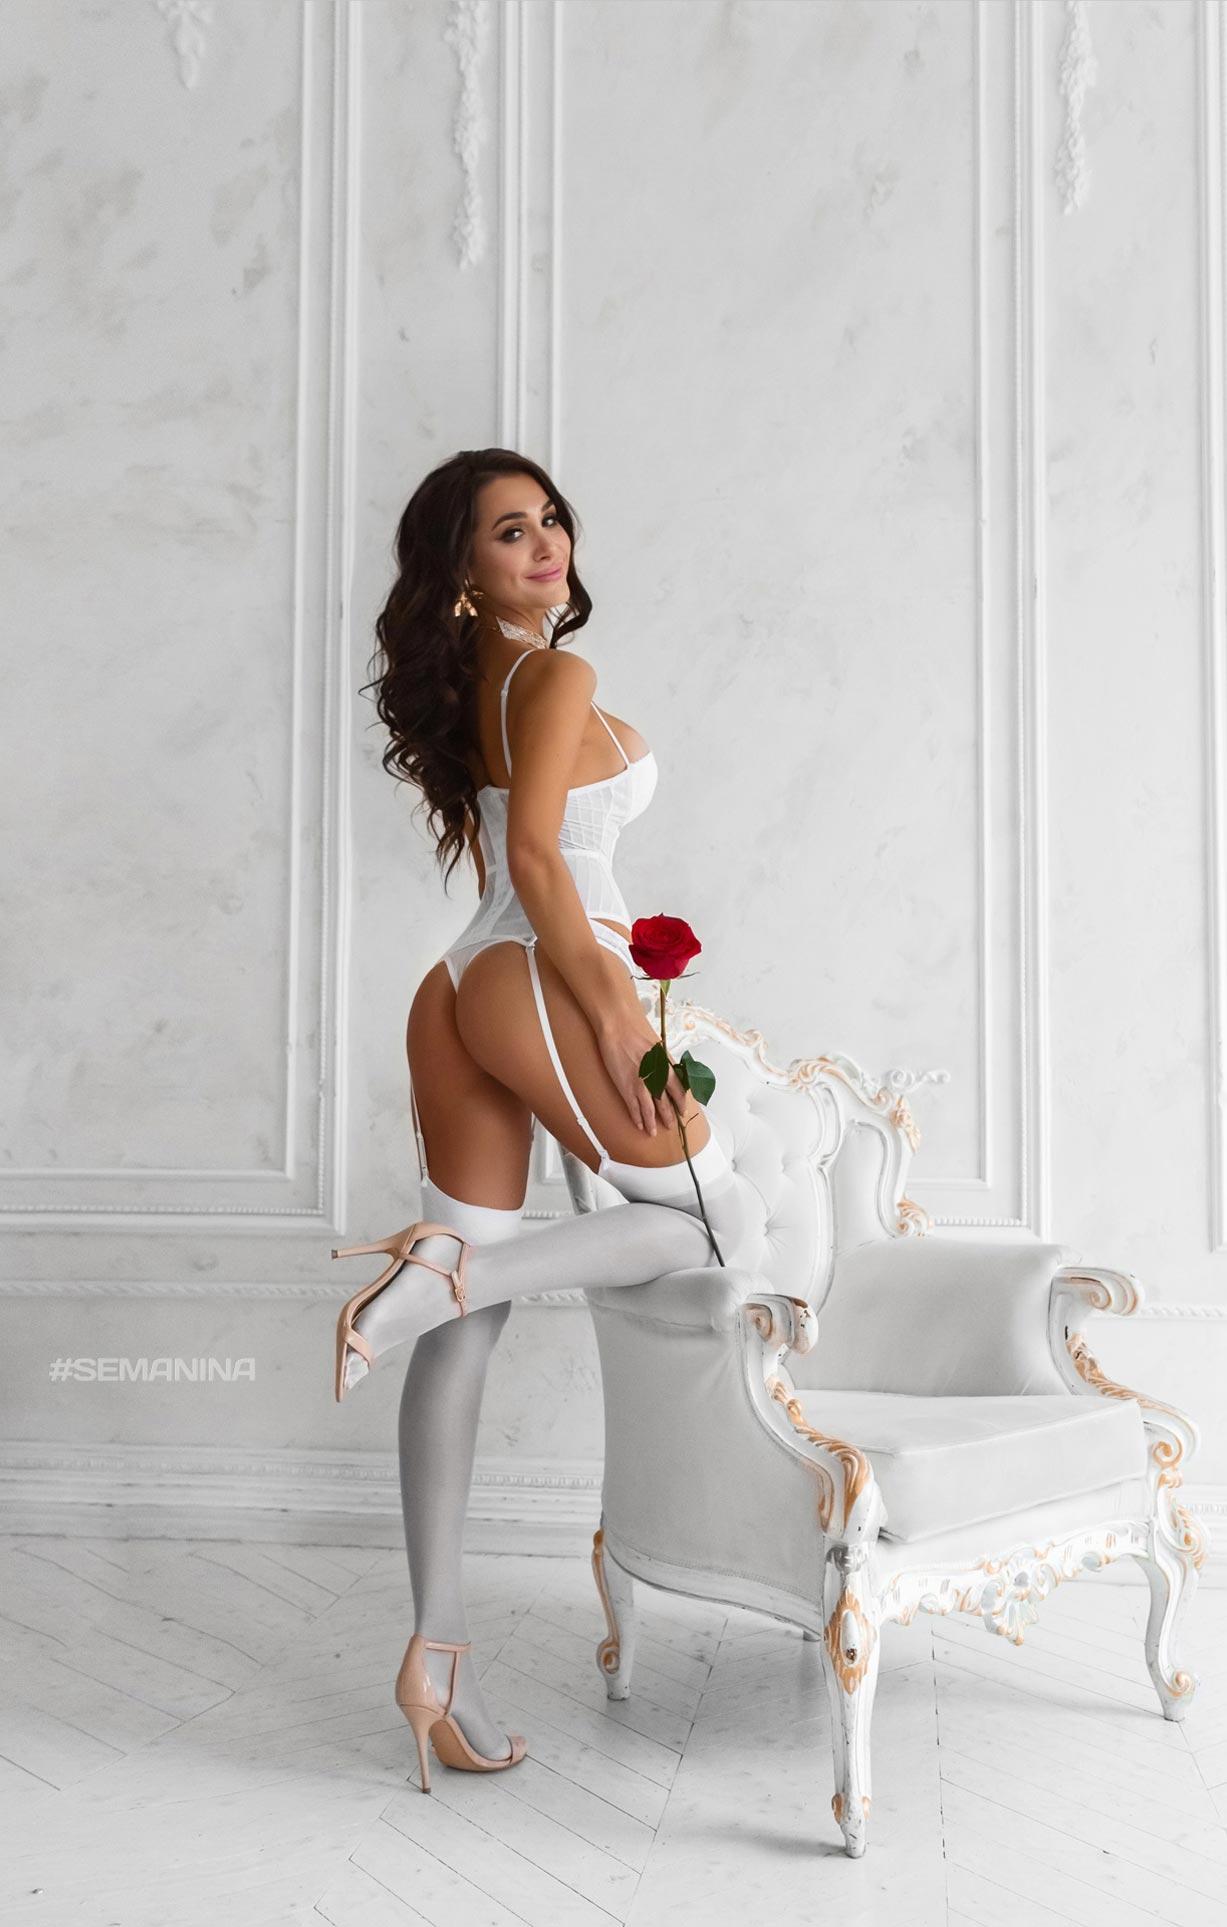 красная роза для Виктории / фото 09